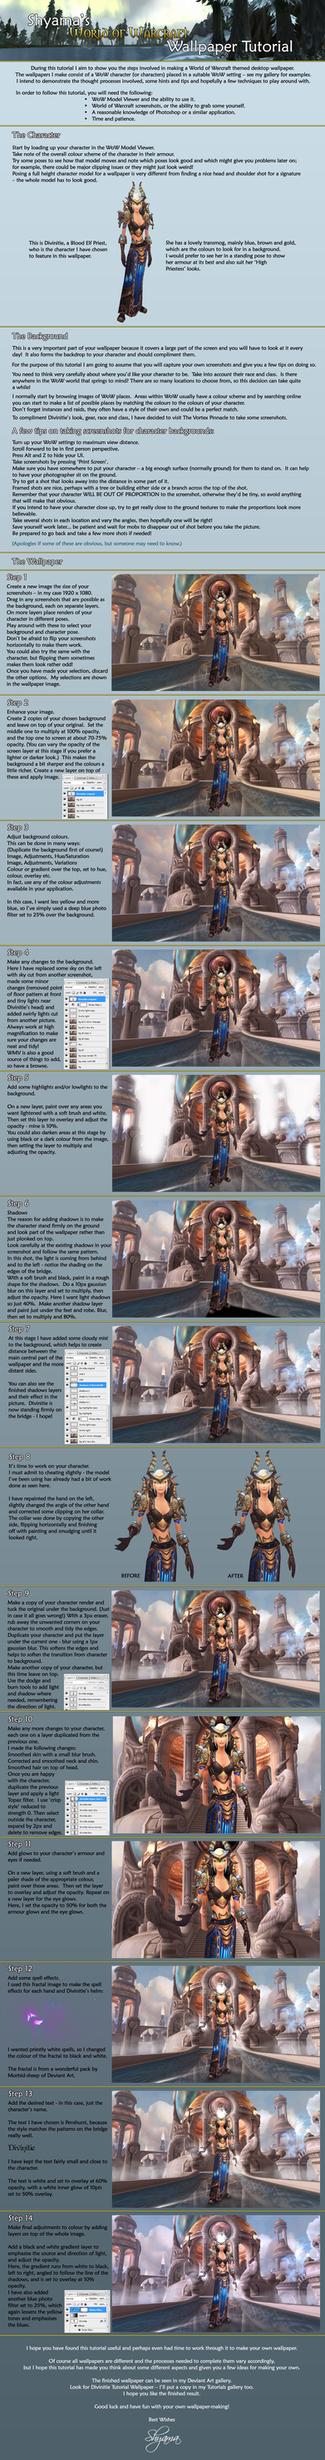 Shyama's World of Warcraft Wallpaper Tutorial by Shyama88